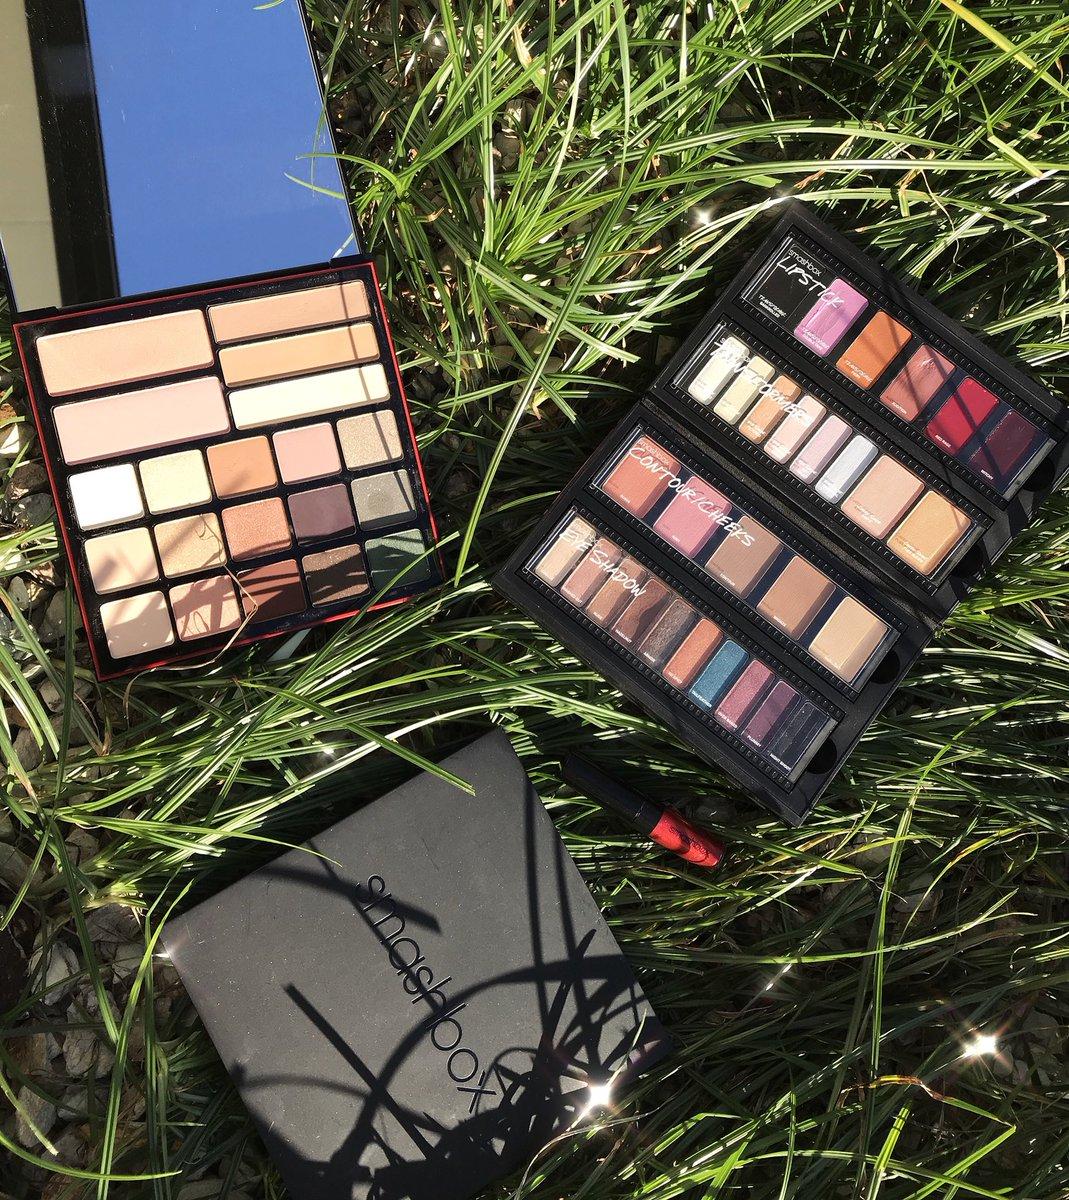 Loving my @Smashbox collection!!! #lippalette #contour #blush #highlight #transformers https://t.co/SAXJWmWMSX